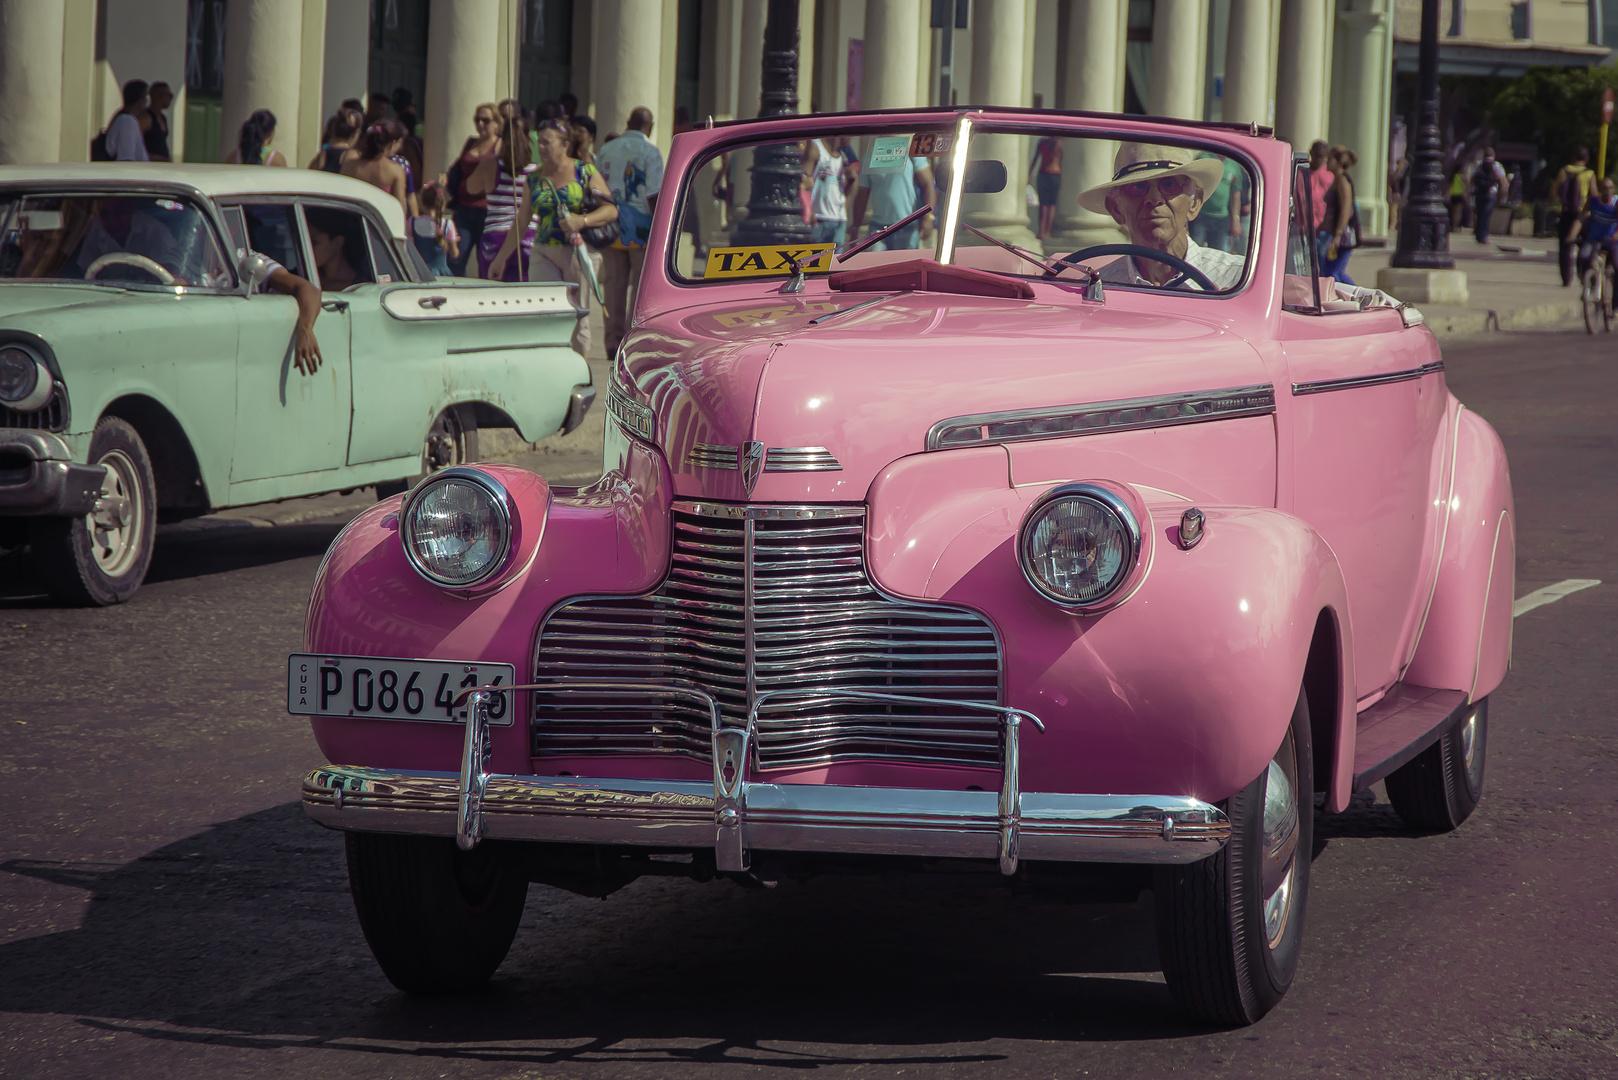 KUBA Oldtimer im Einsatz